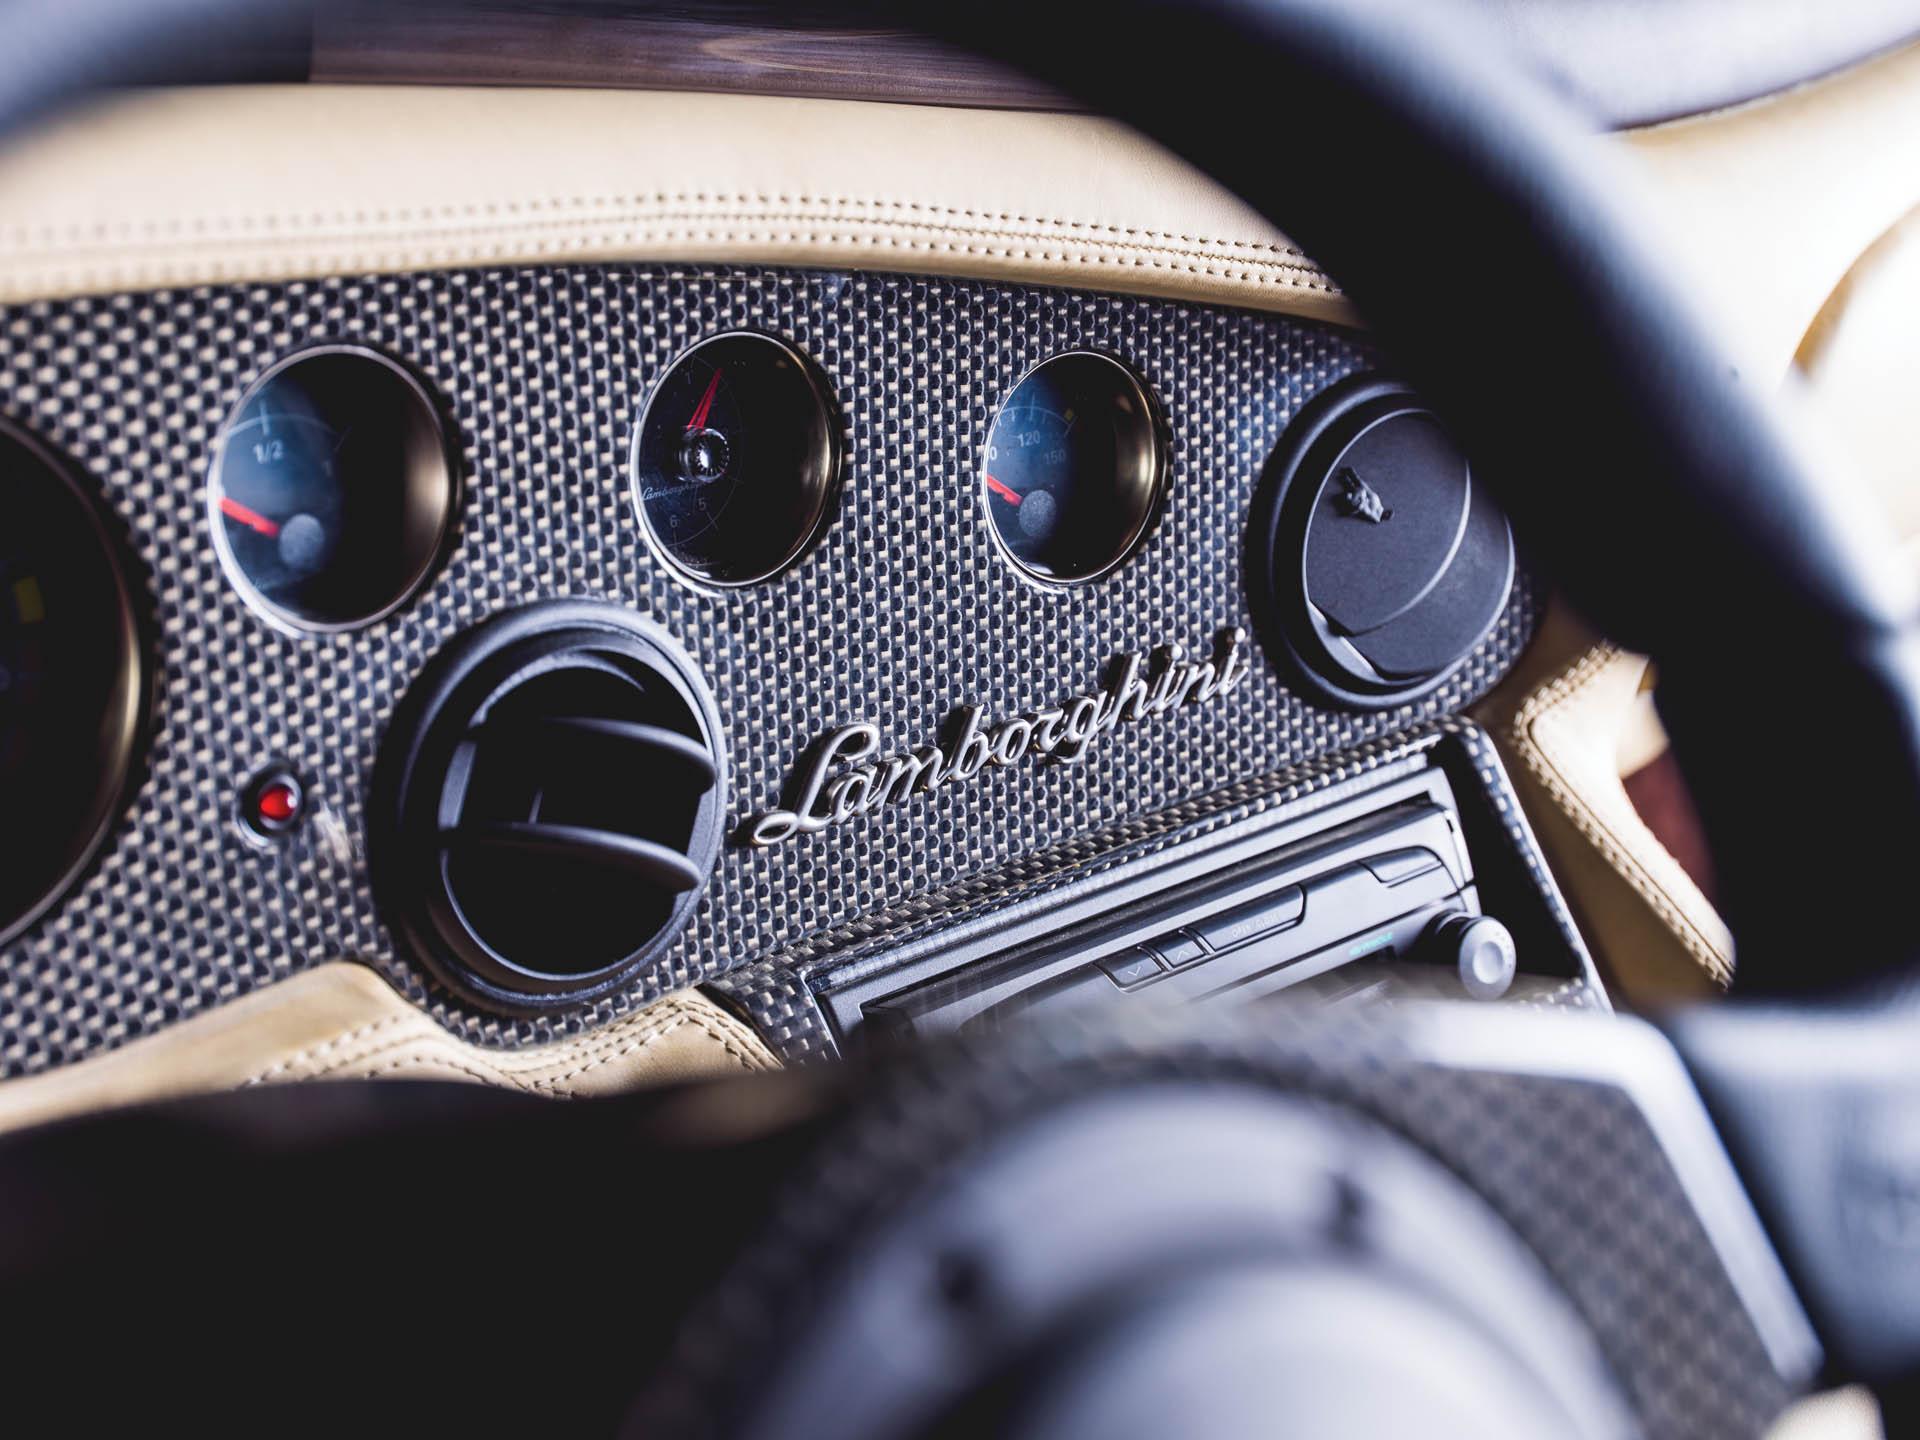 Lamborghini Diablo VT 6.0 SE for sale (11)